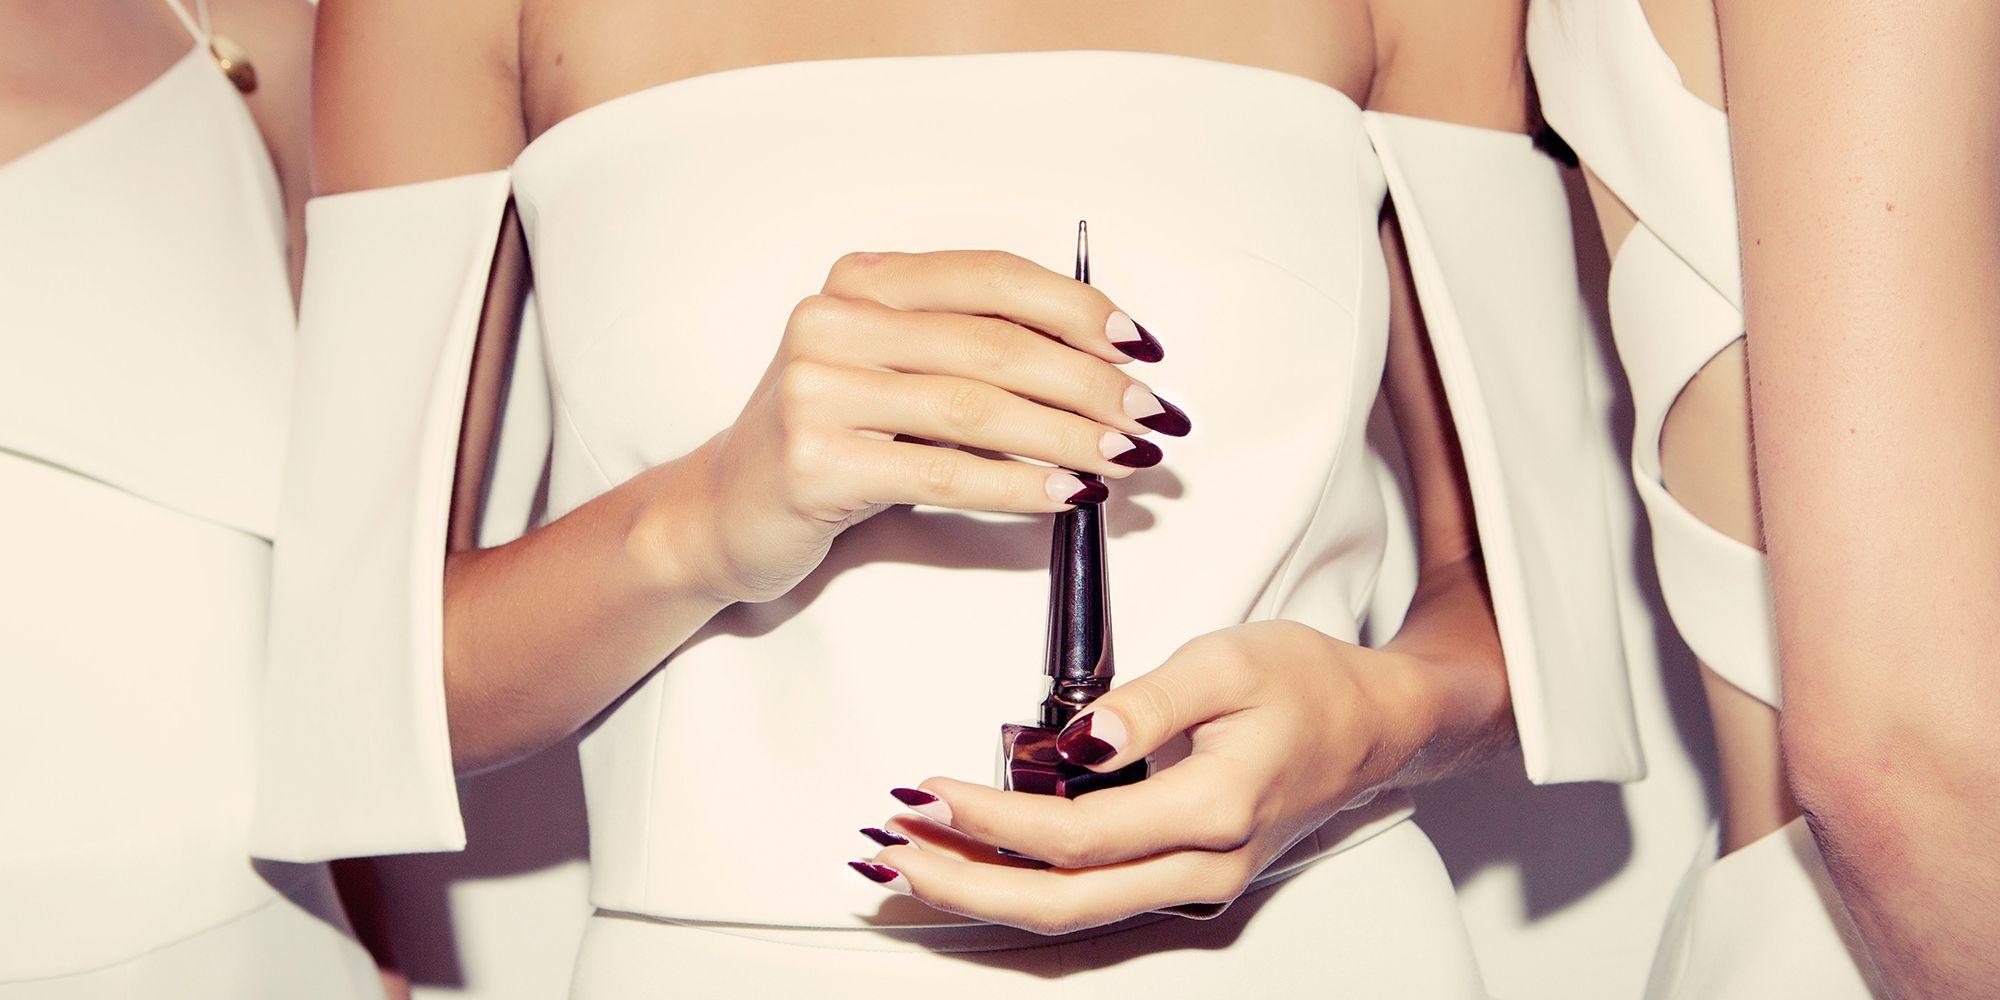 Louboutin nail art, Cushnie Et Ochs SS/16 show